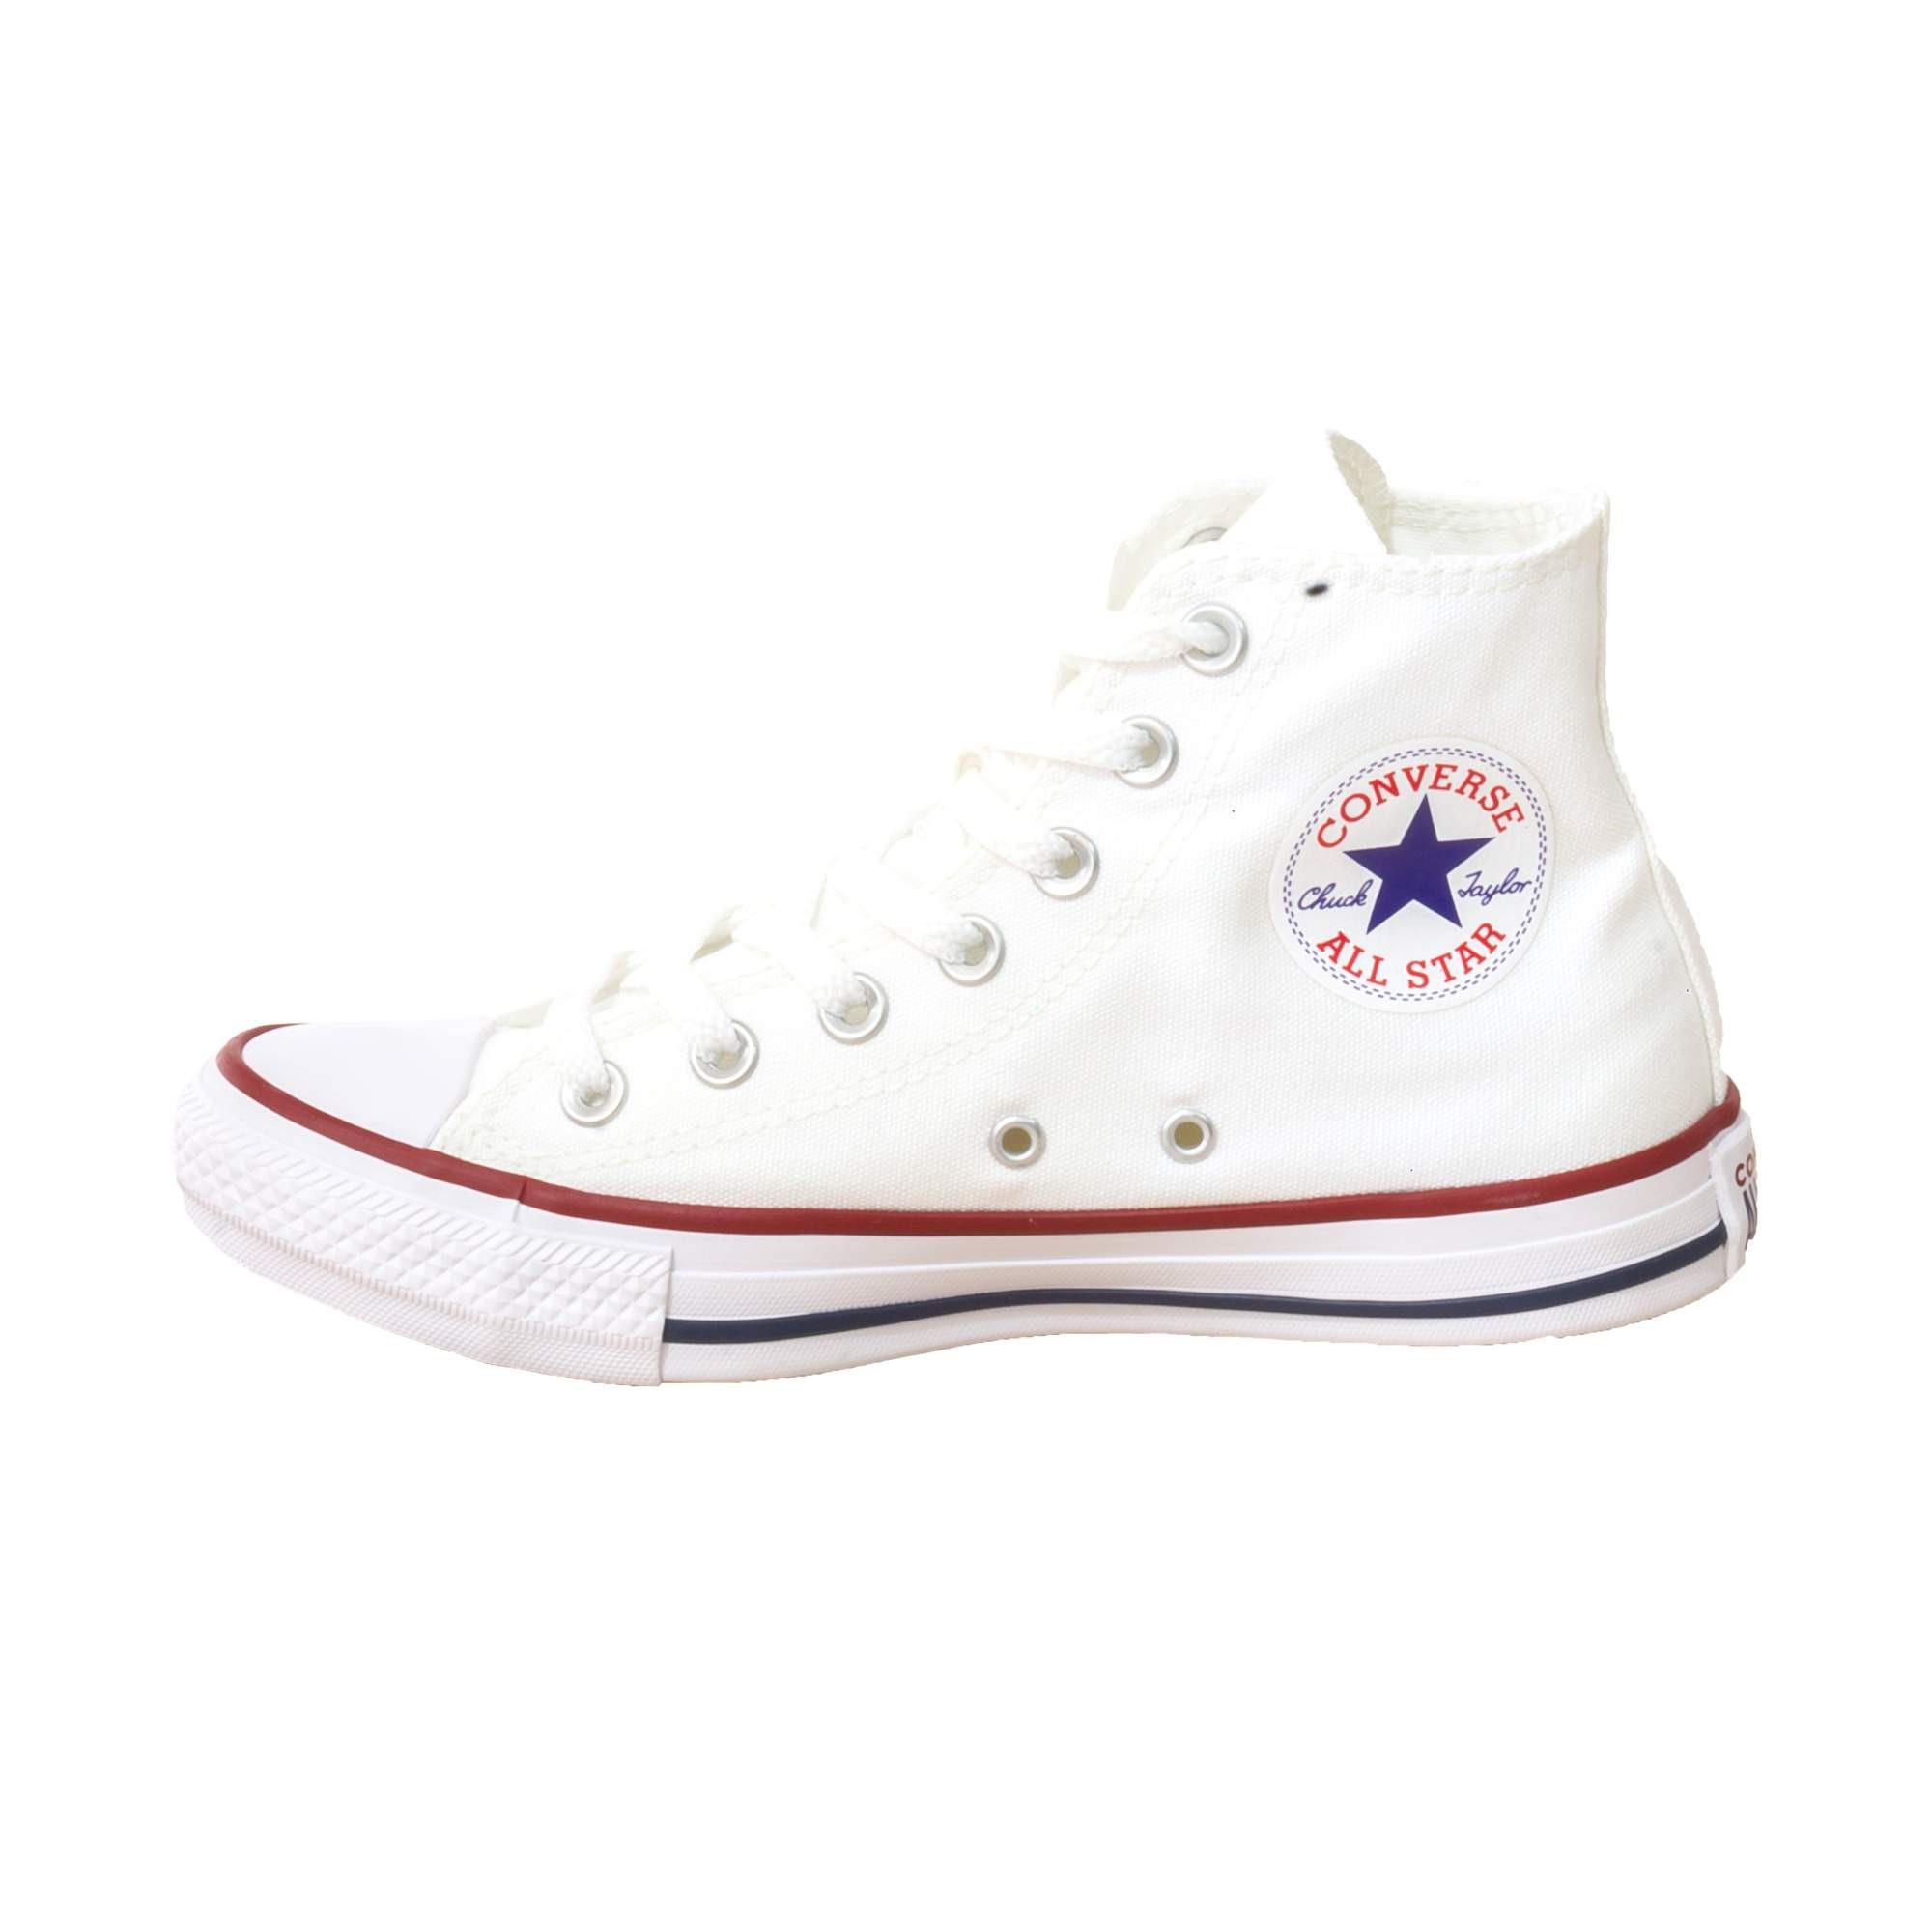 Tênis Converse All Star Chuck Taylor Branco Cano Longo